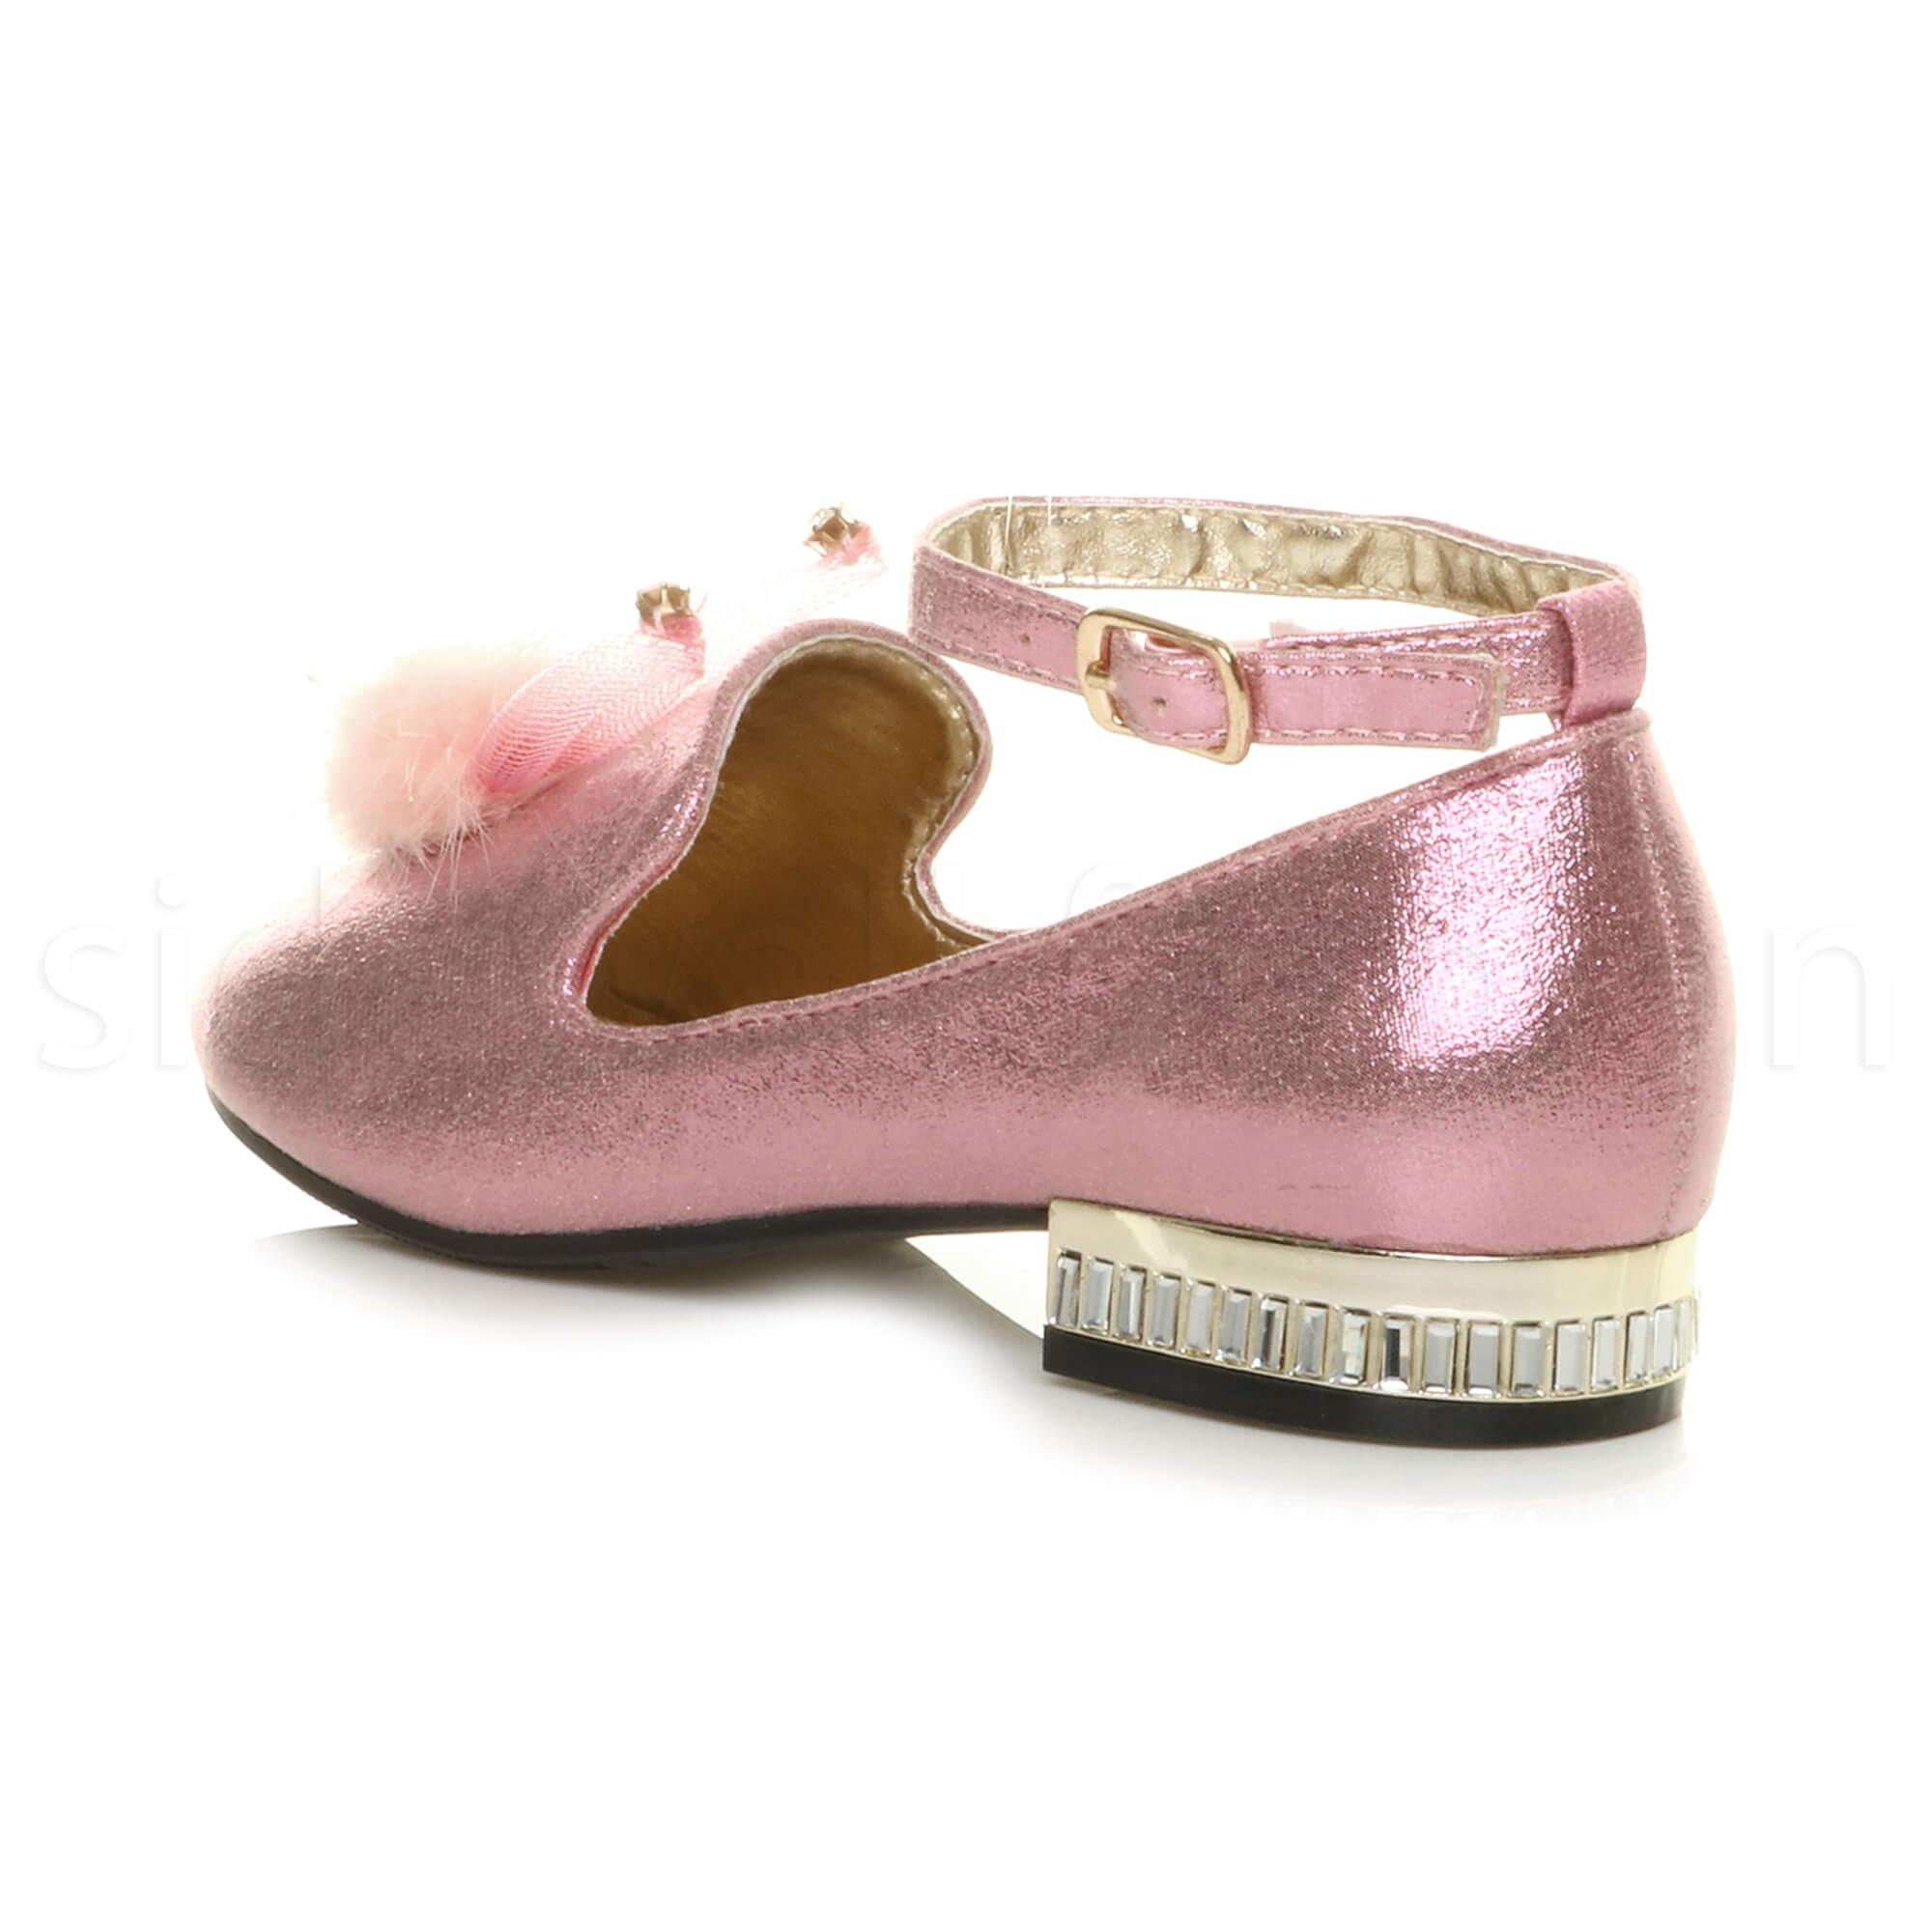 Girls childrens kids rabbit ears diamante pom pom loafers bridesmaid shoes size